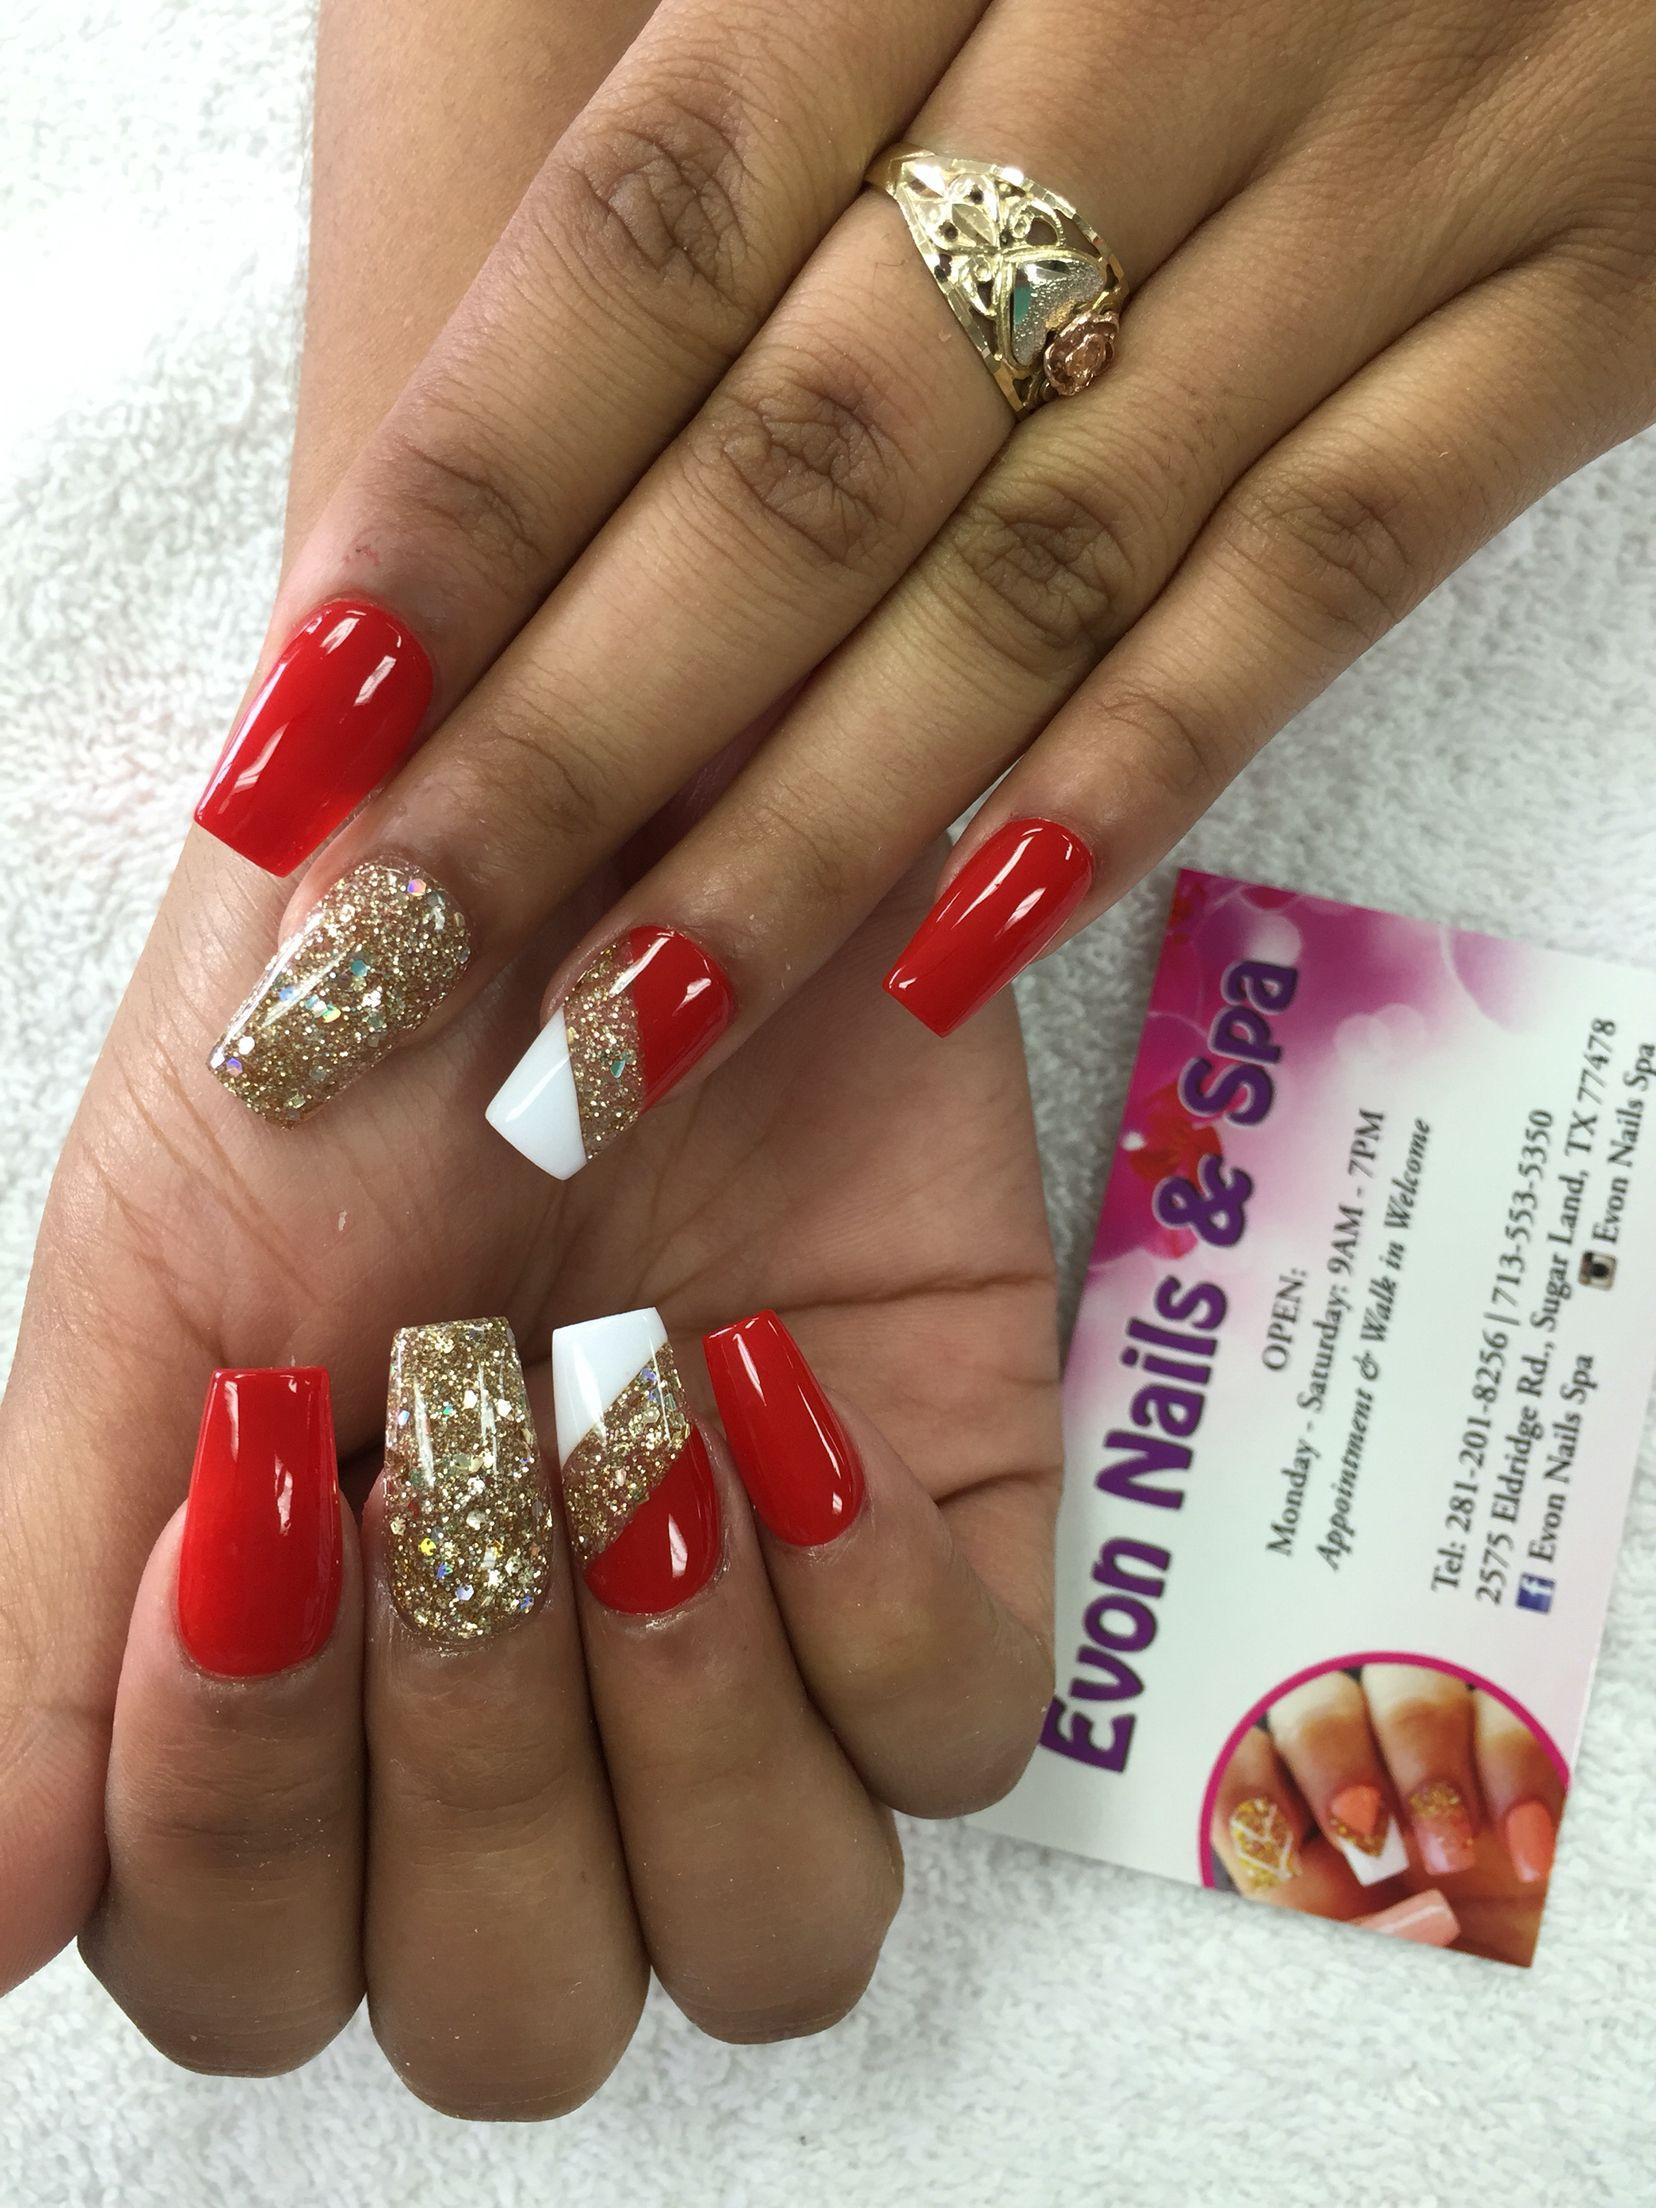 Evon Nails Spa 2575 Eldridge Rd Sugar Land Tx 77478 United States Nail Spa Nails Nail Art